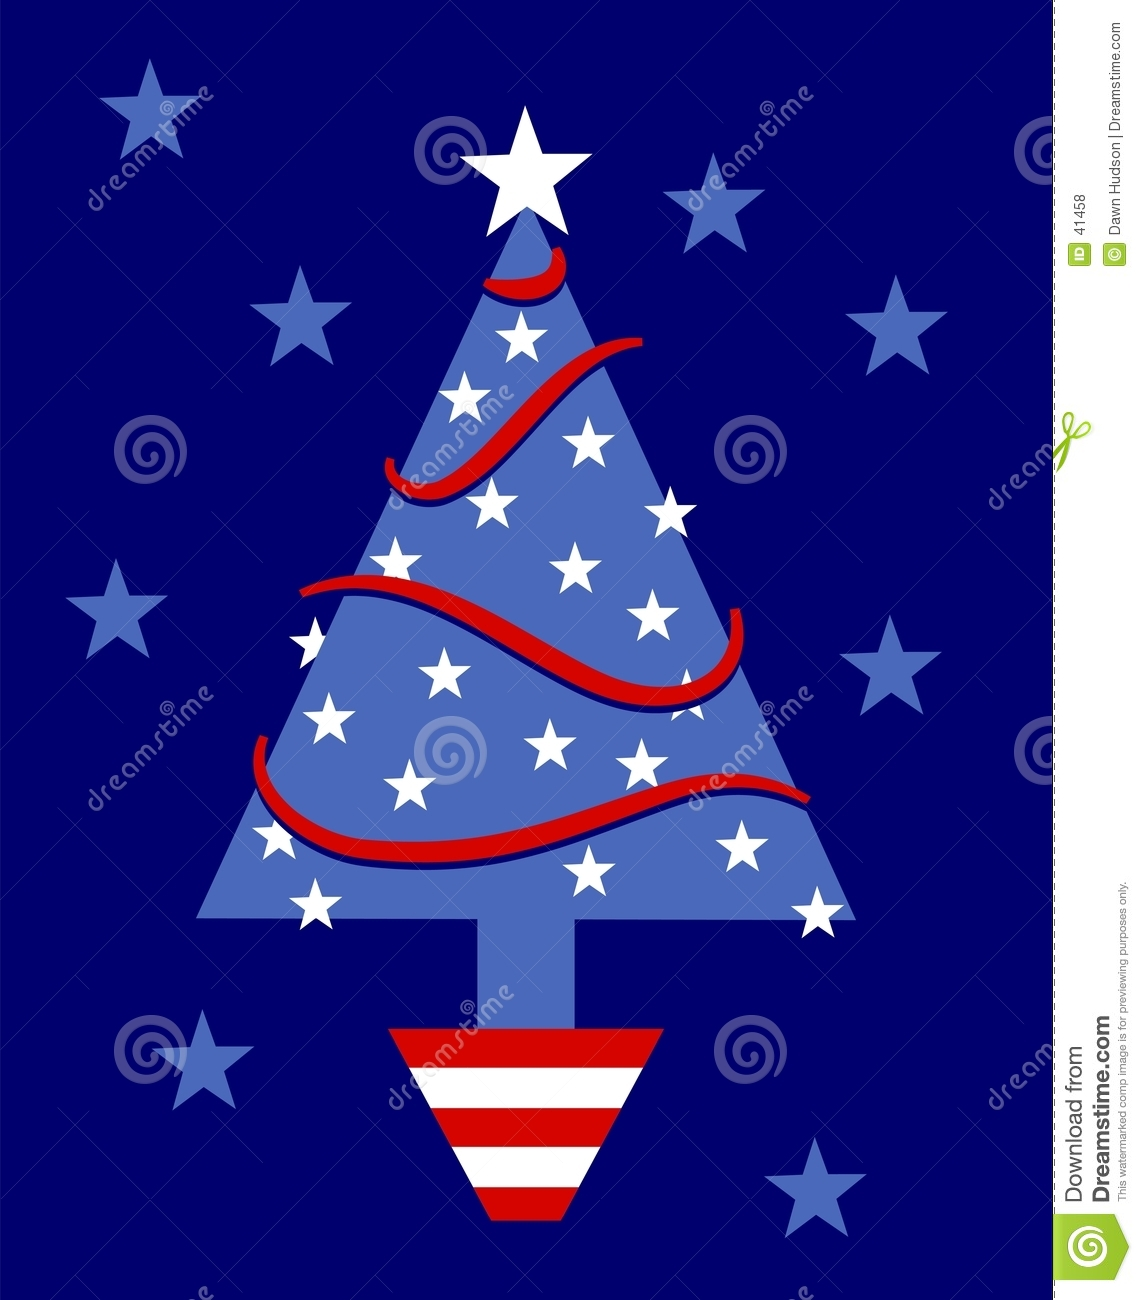 Patriotic Christmas Tree Clipart.